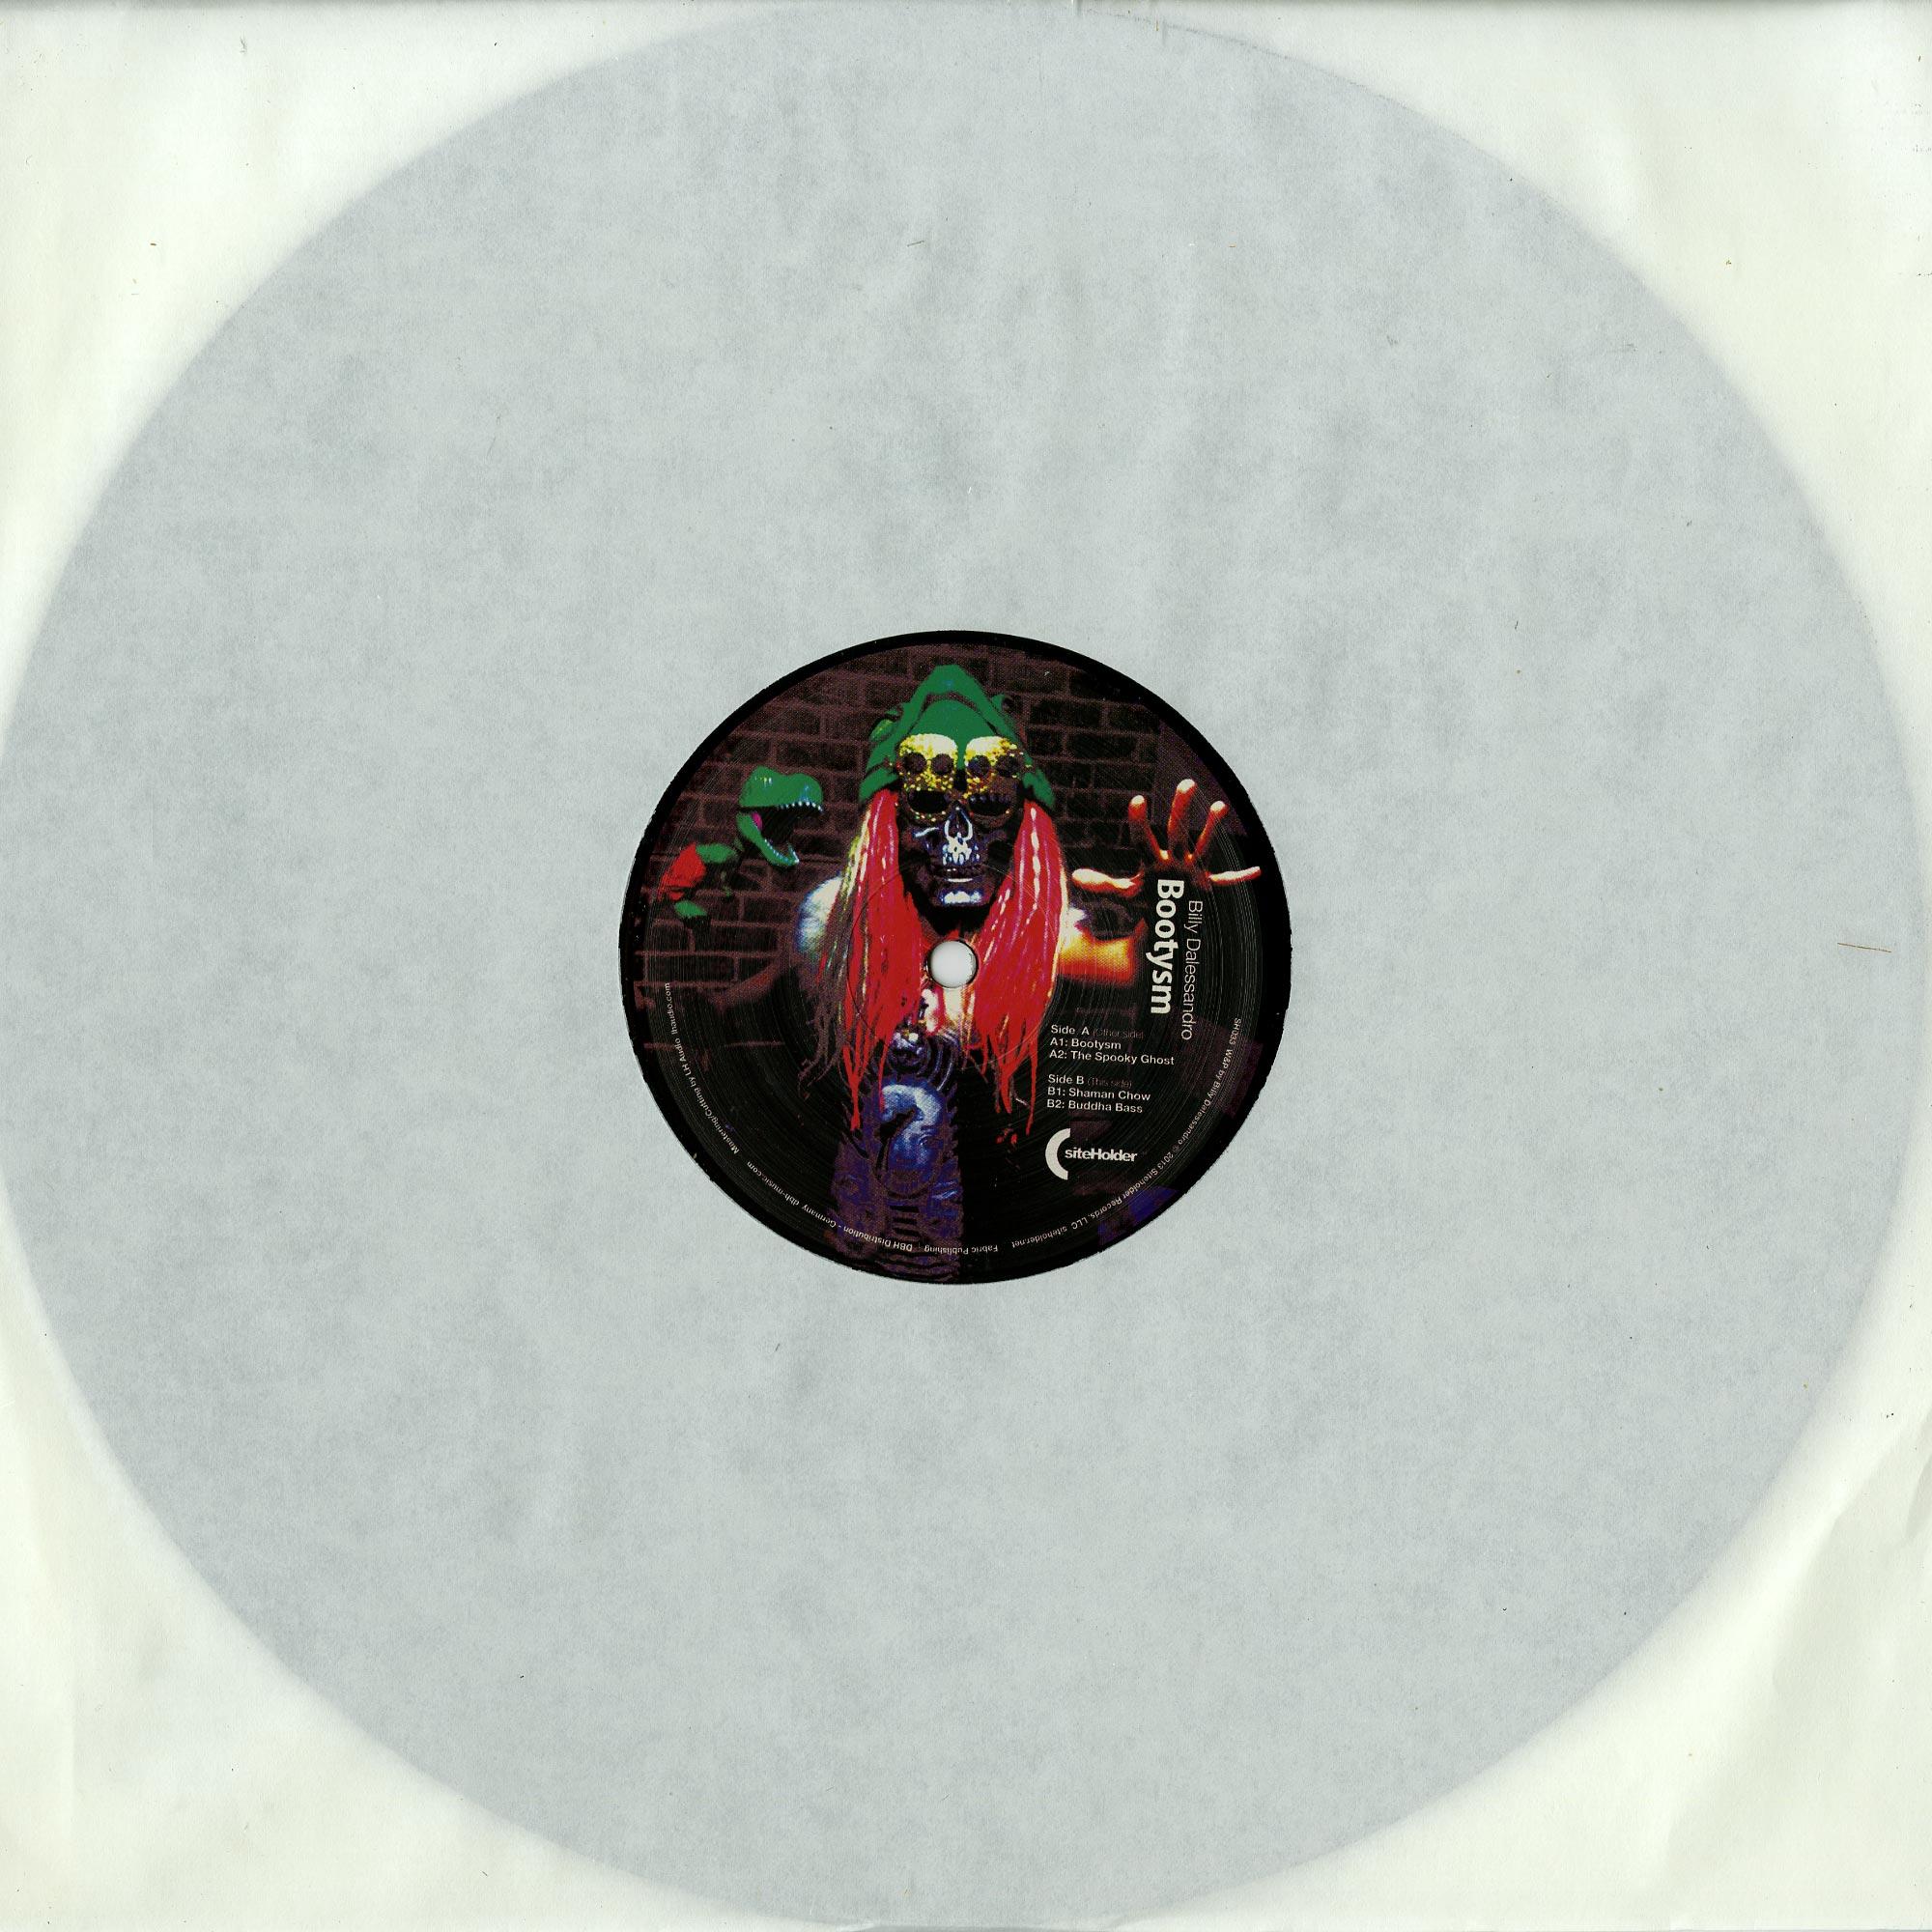 Billy Dalessandro - BOOTYSM